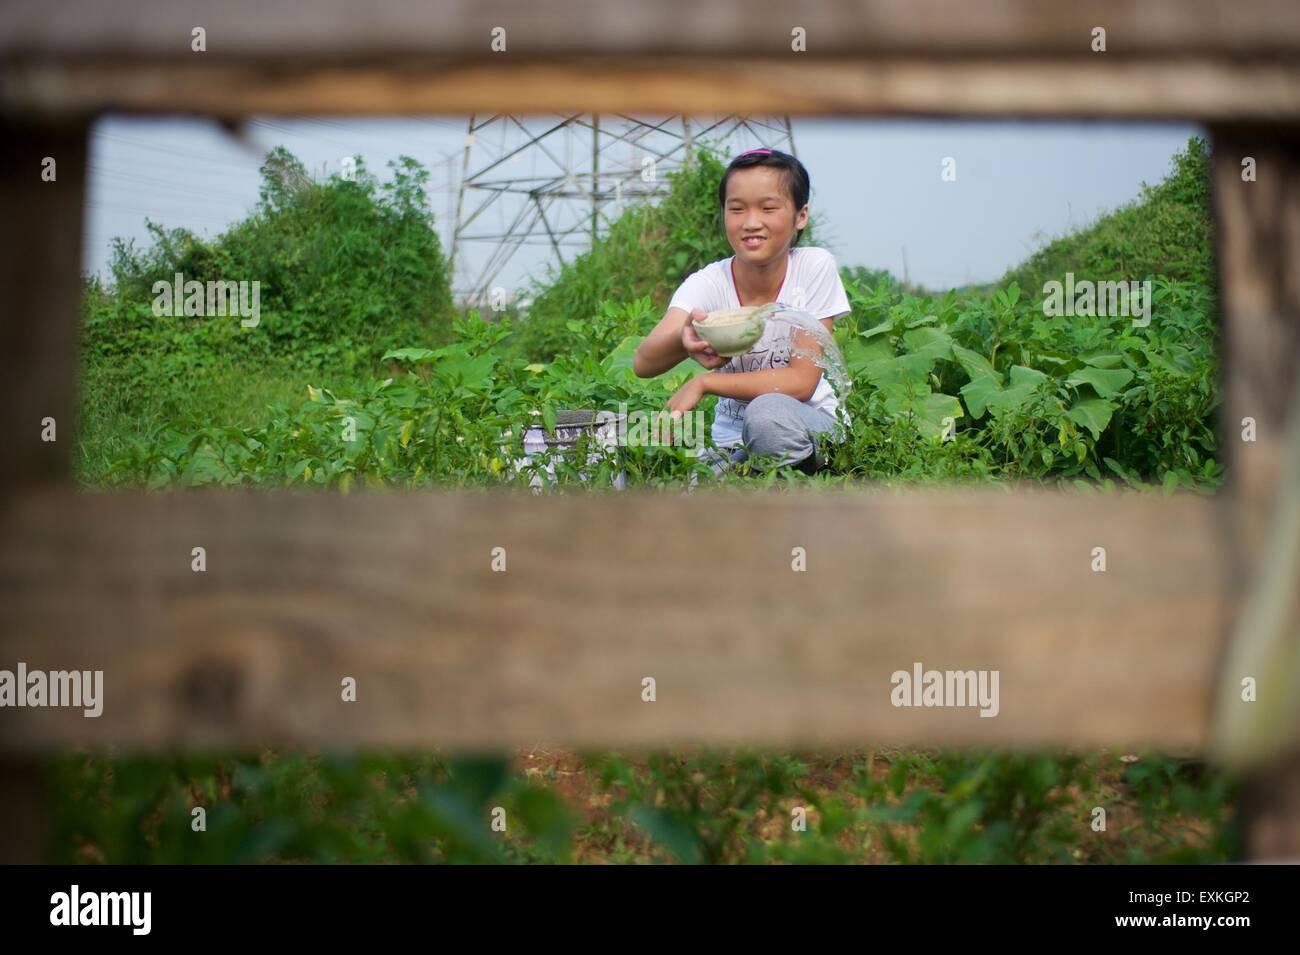 Nanchang, Nanchang City of east China's Jiangxi Province. 14th July, 2015. Li Wenyu waters vegetable at home - Stock Image